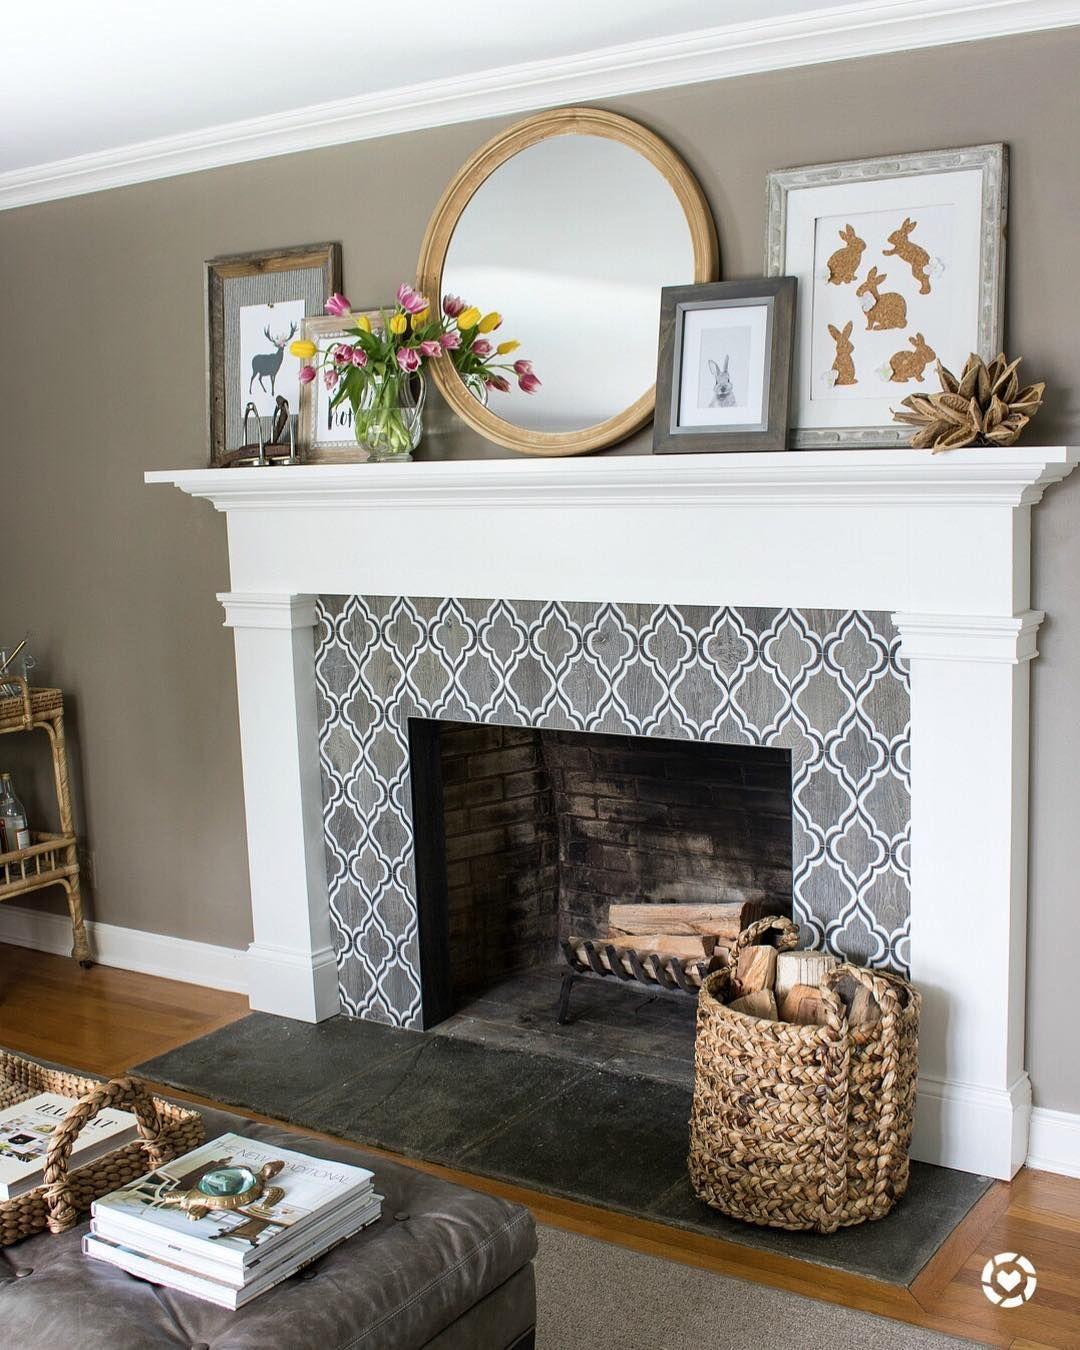 Love this idea for a fireplace kris jarrett drivenbydecor on